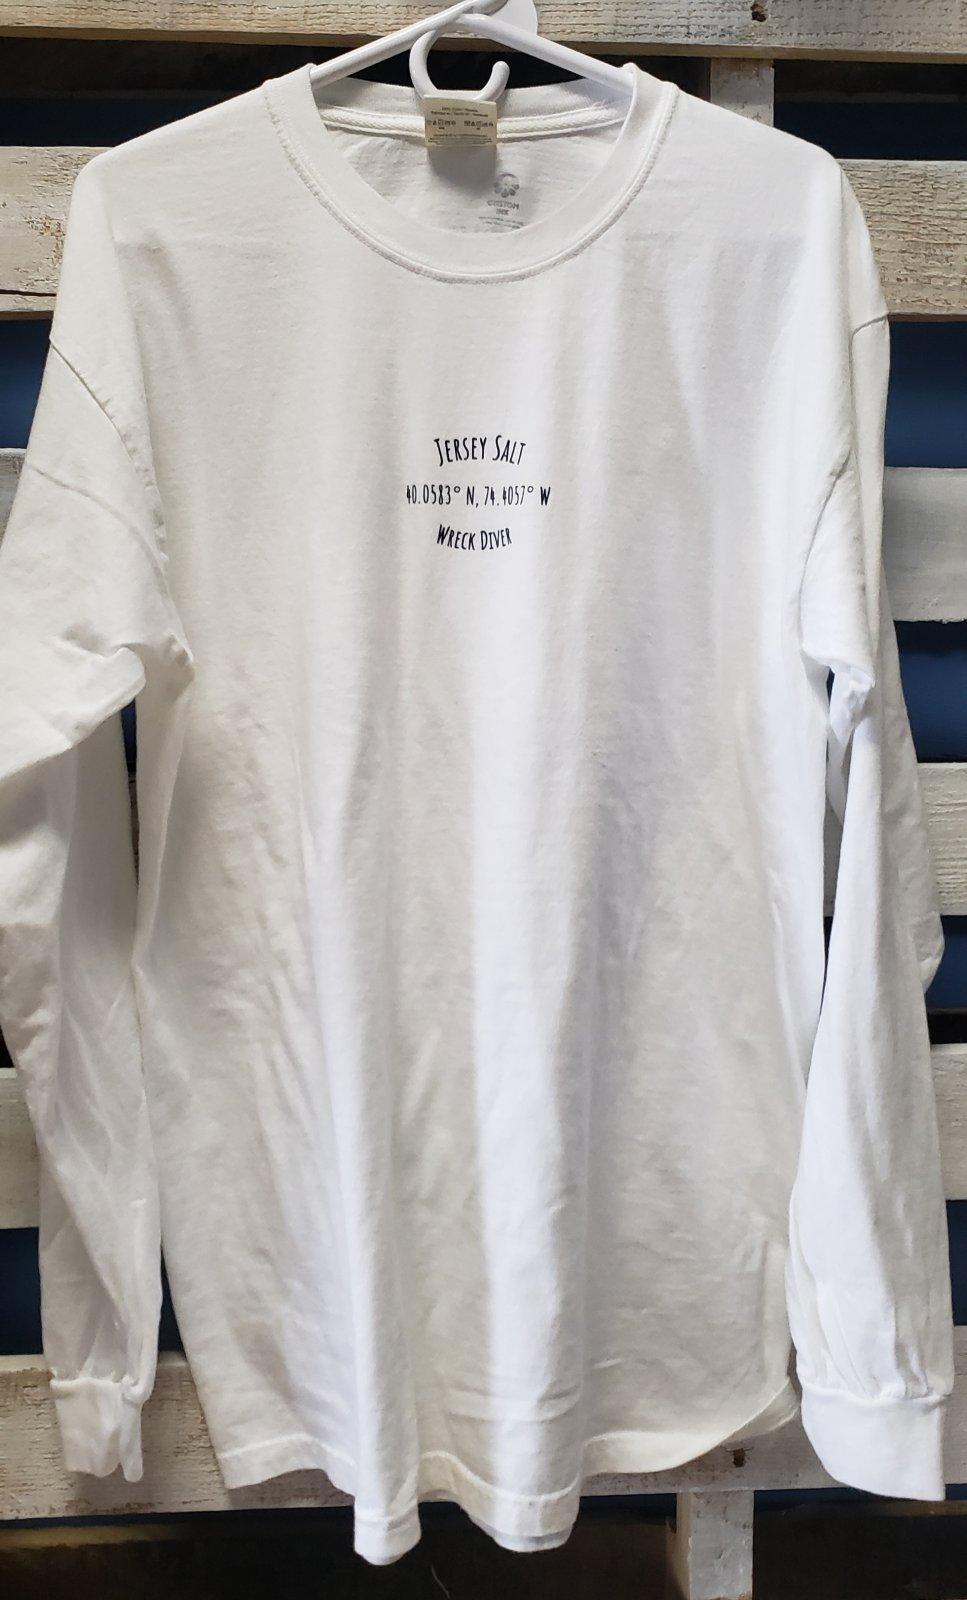 NJ Wreck Diver Long Sleeve T-Shirt